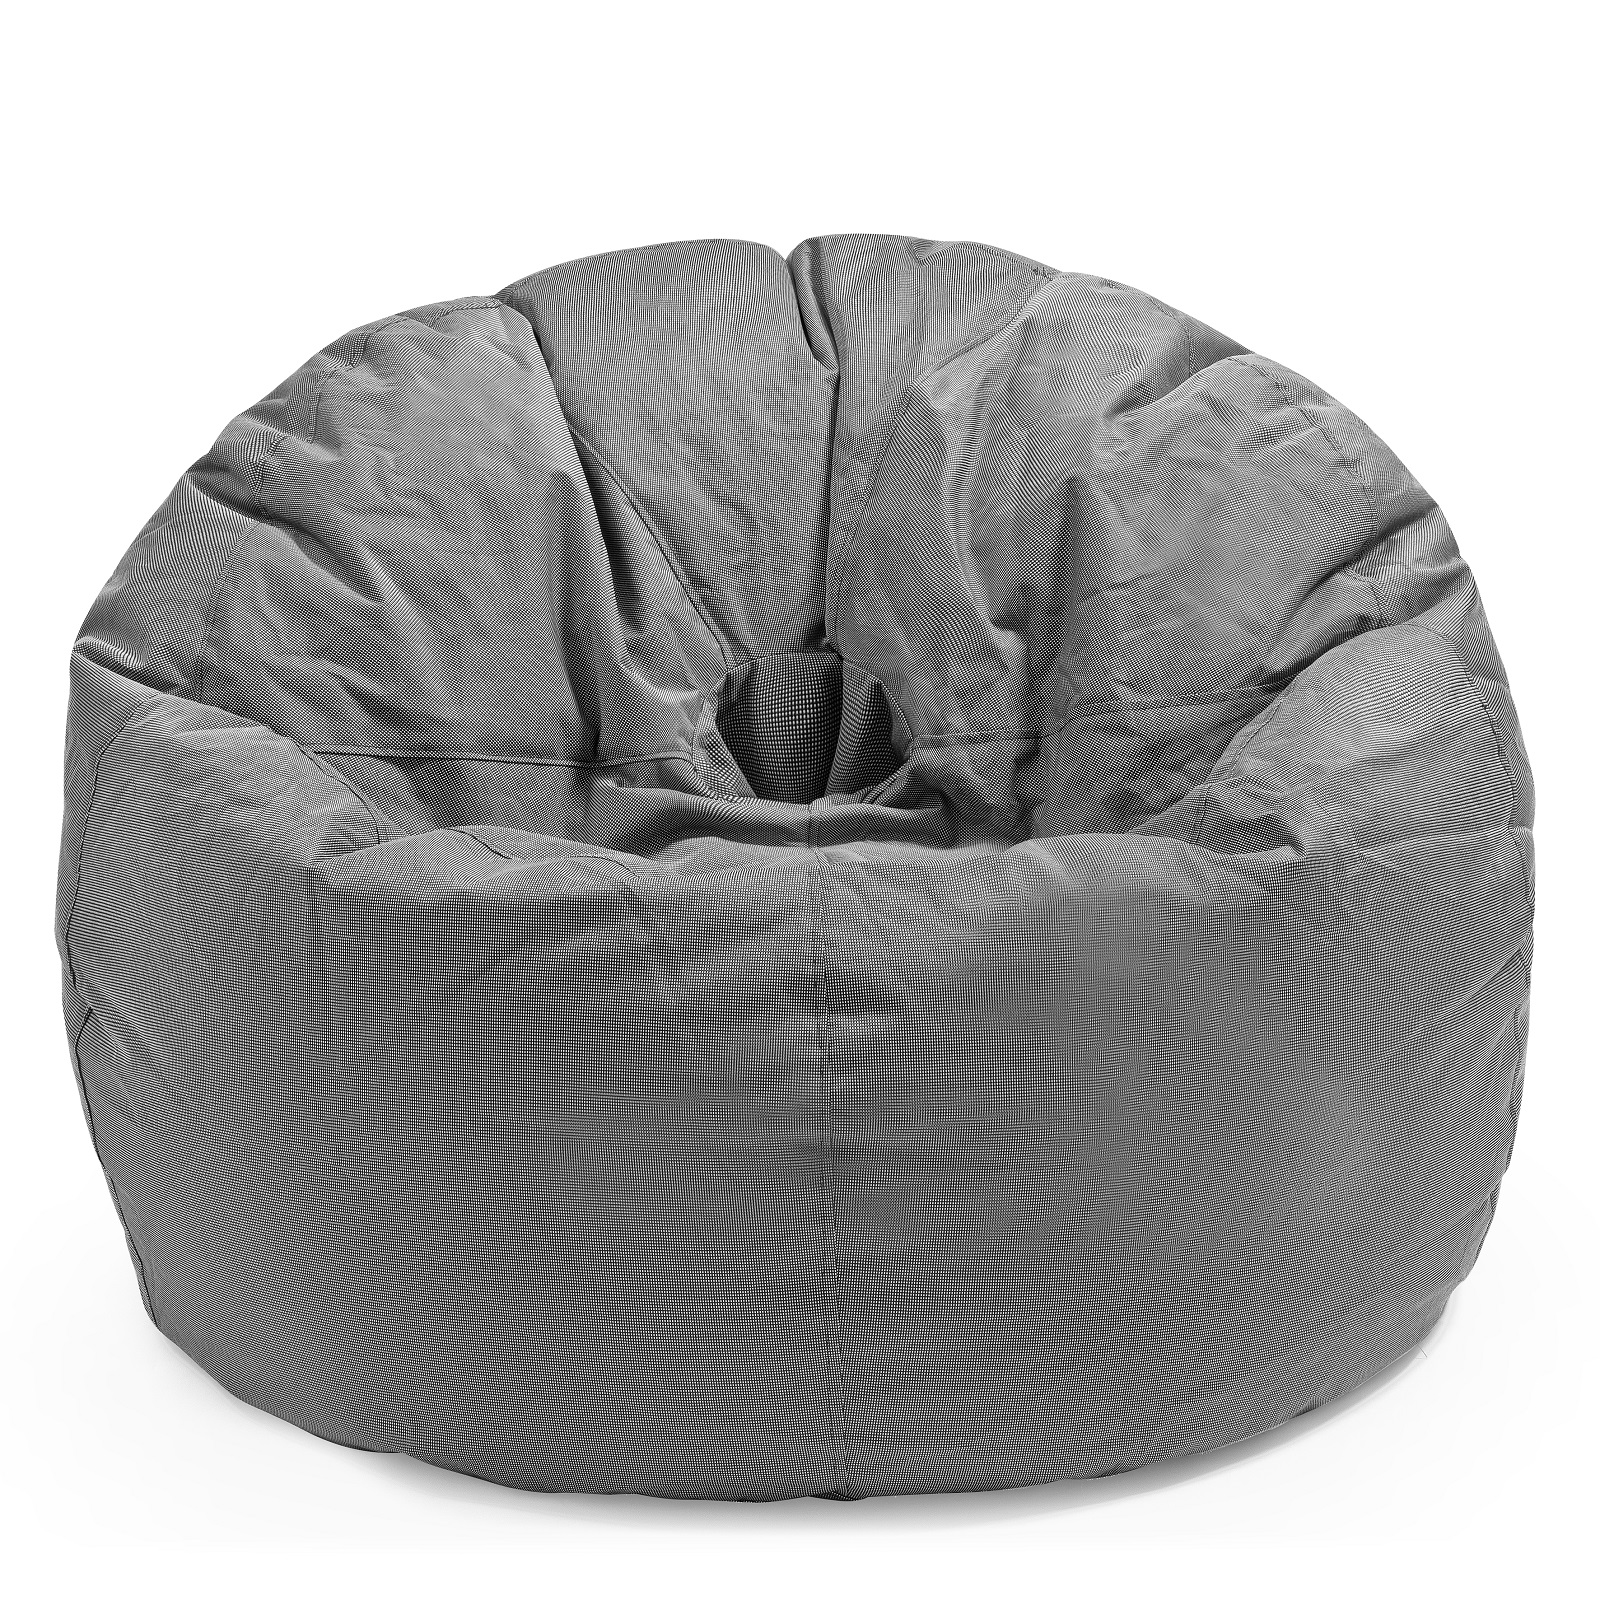 outbag outdoor sitzsack donut 90 x 75 cm wetterfest sessel lounge garten ebay. Black Bedroom Furniture Sets. Home Design Ideas